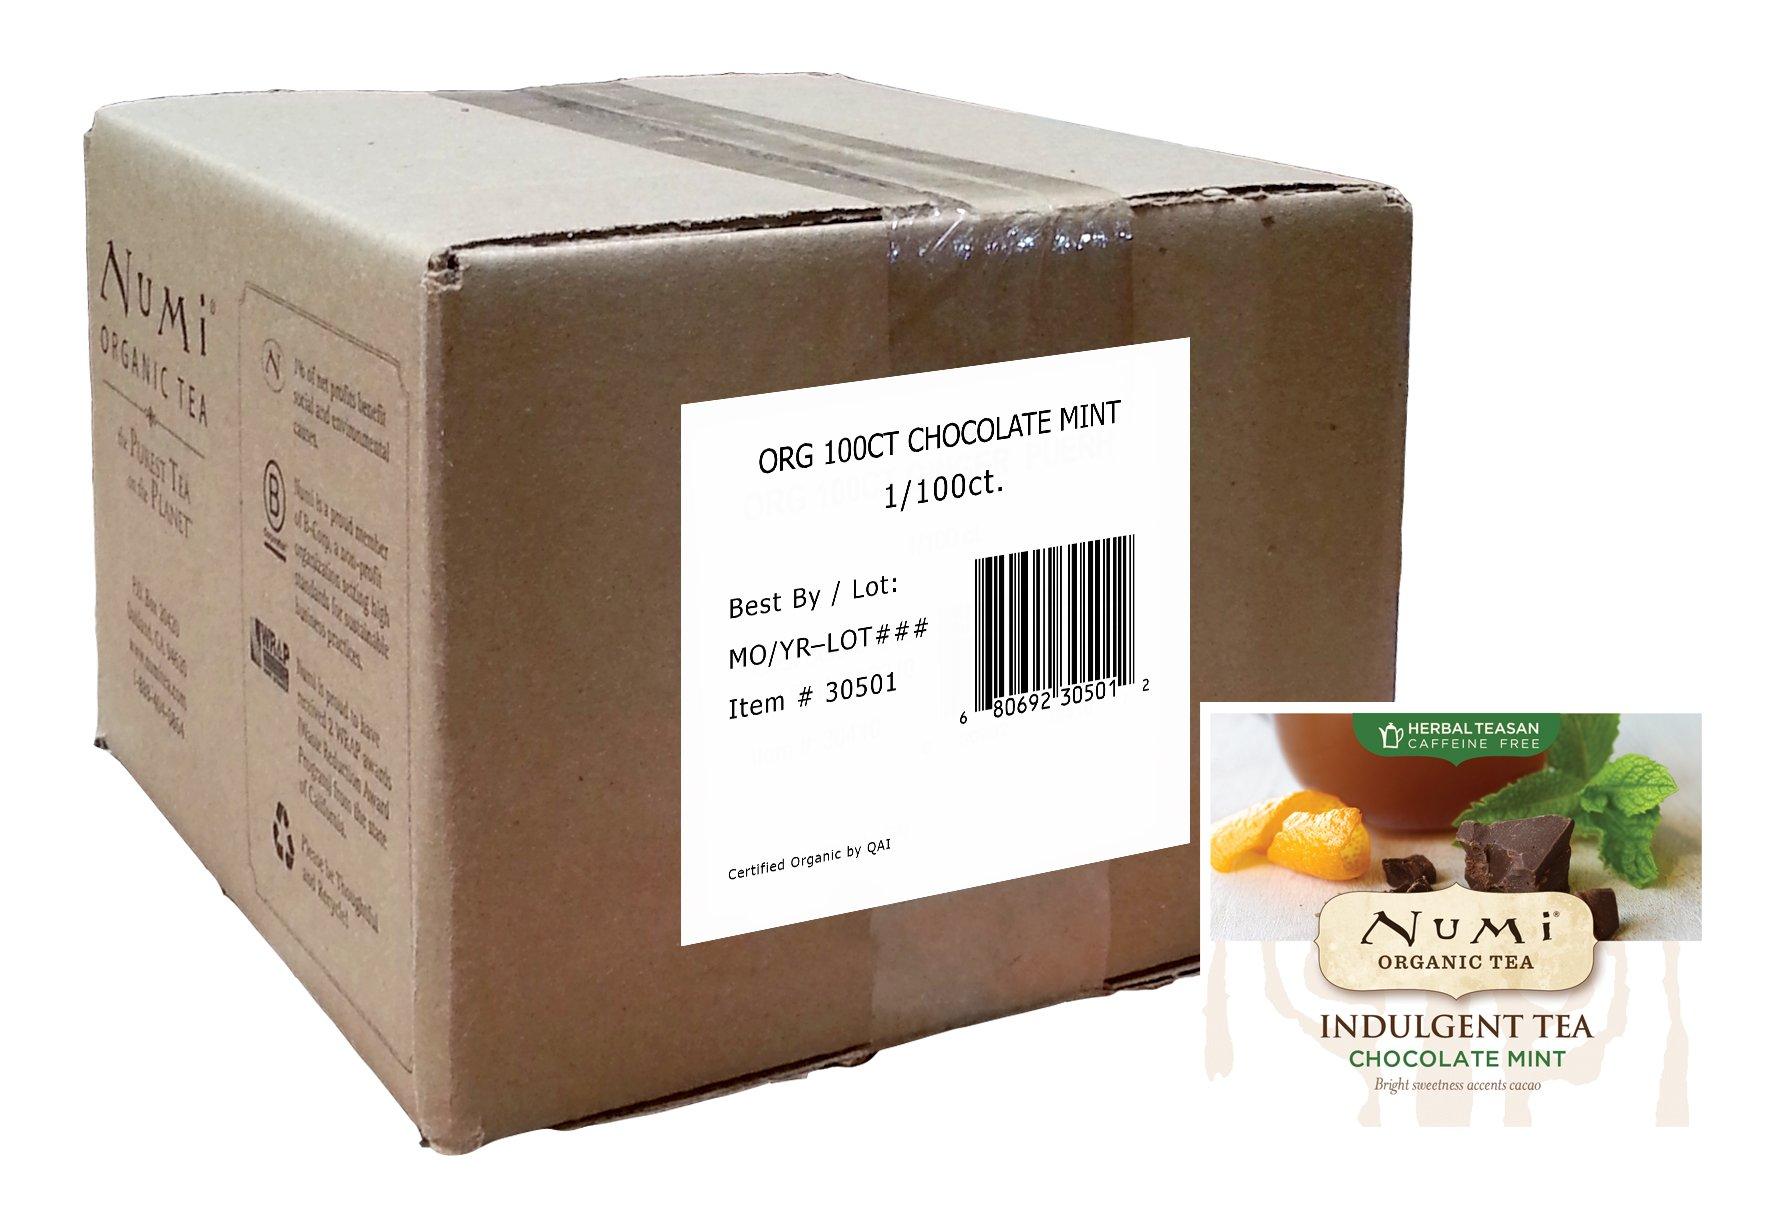 Numi Organic Indulgent Tea, Chocolate Mint, 100 Count Bulk non-GMO Tea Bags by Numi Organic Tea